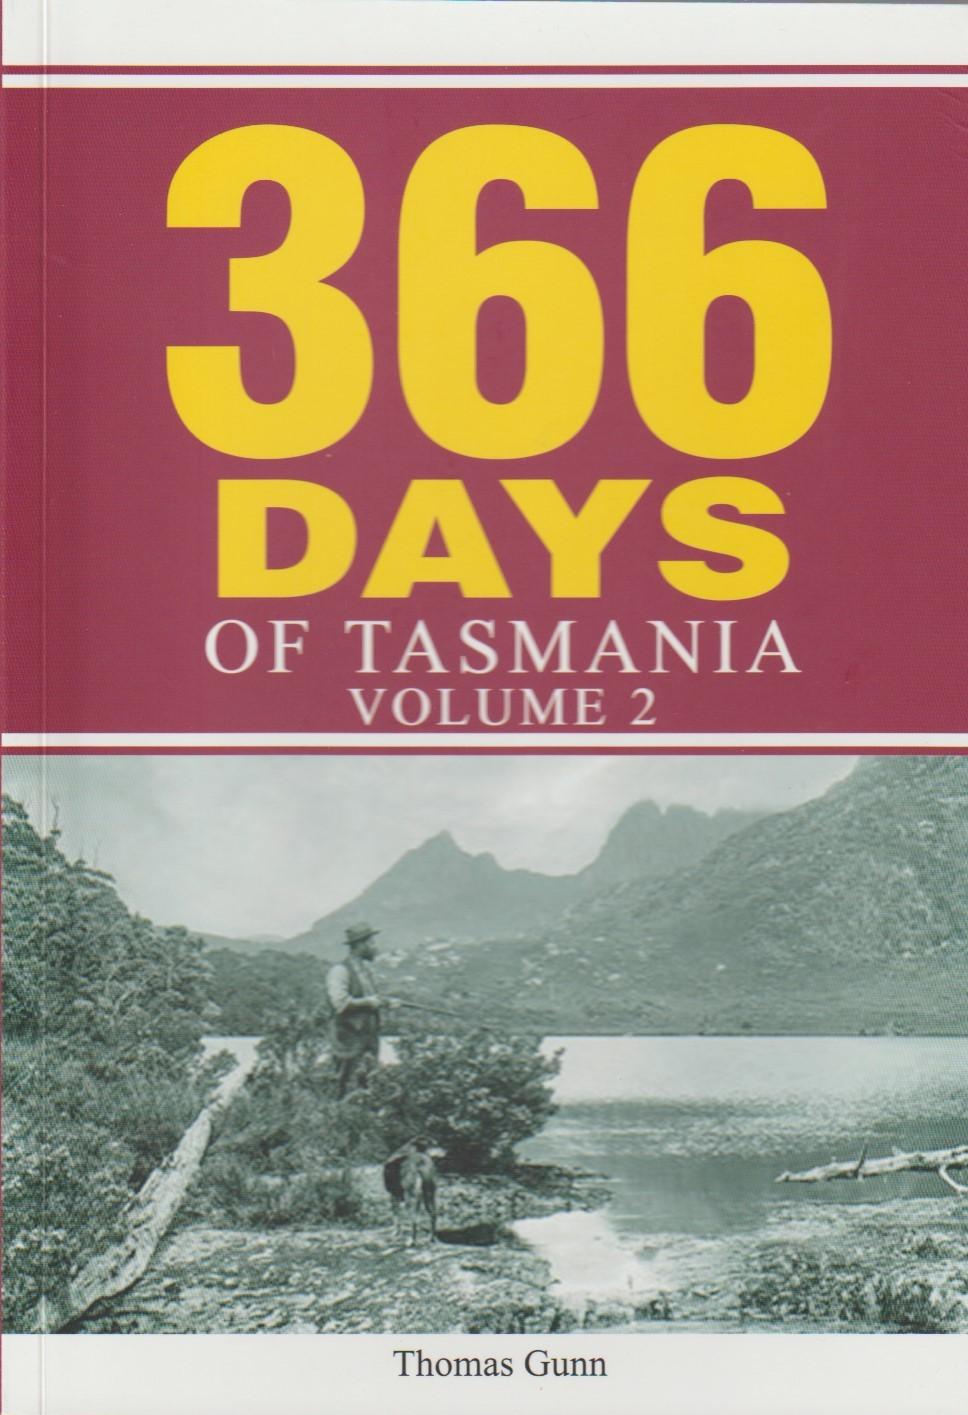 366 Days of Tasmania Volume 2